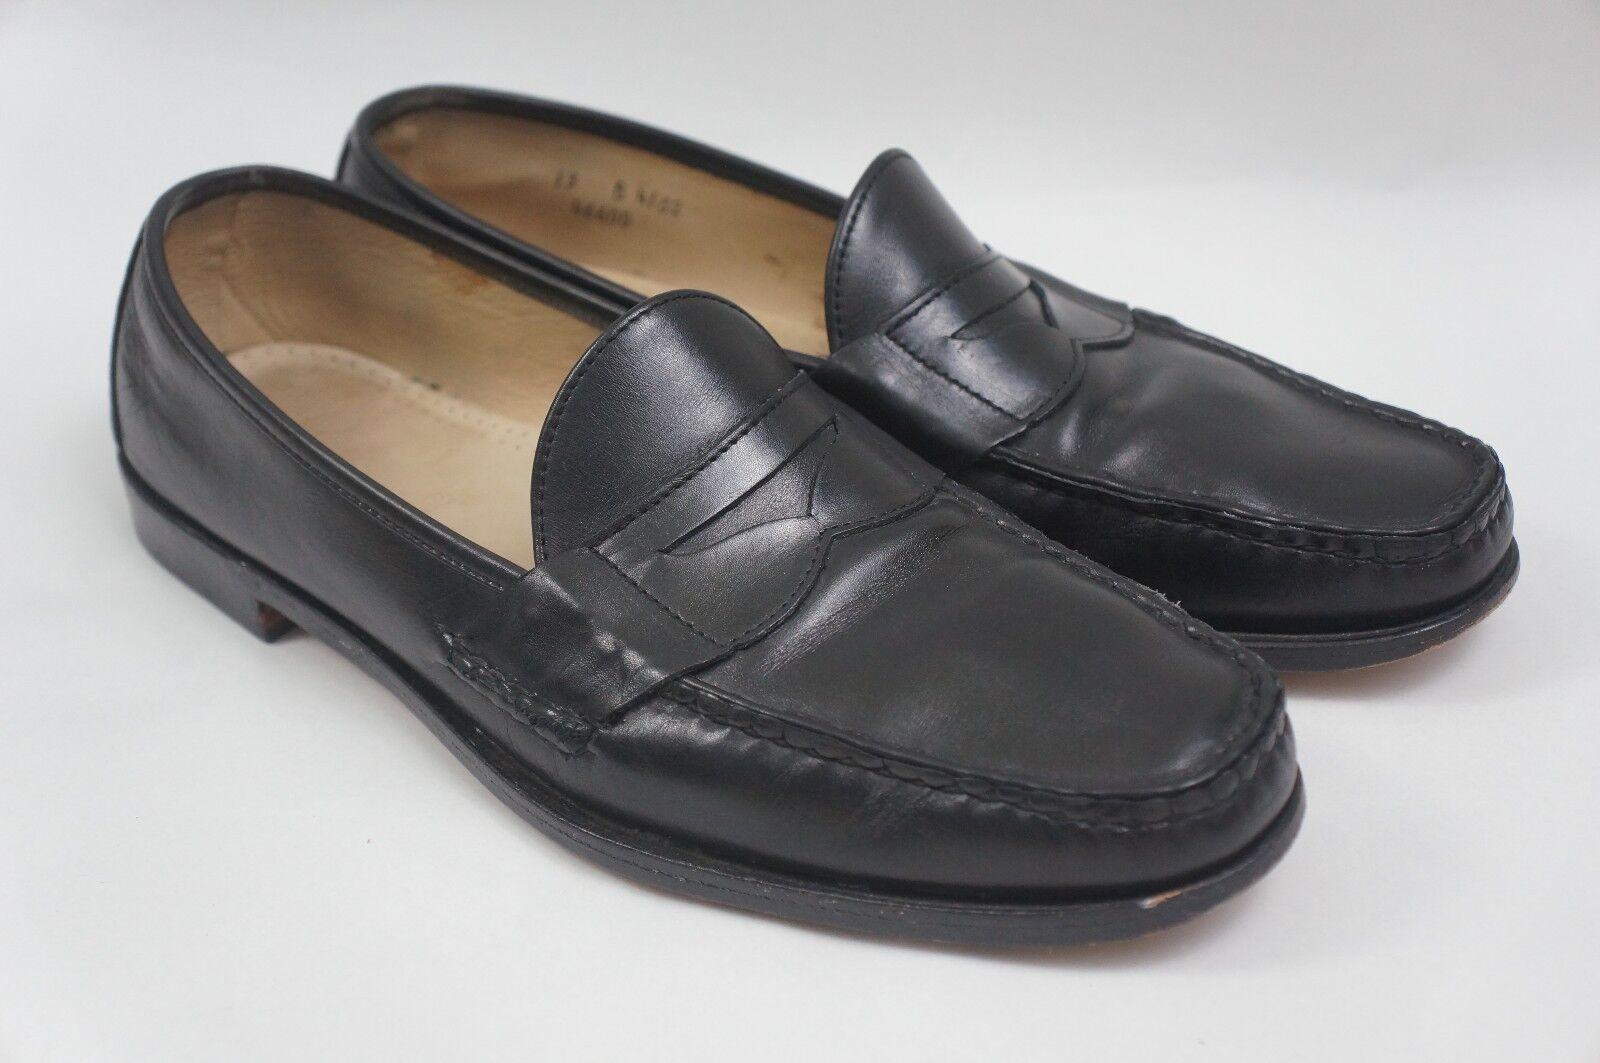 ALLEN EDMONDS HANOVER Homme Chaussures Taille 13 B Mocassins Noir